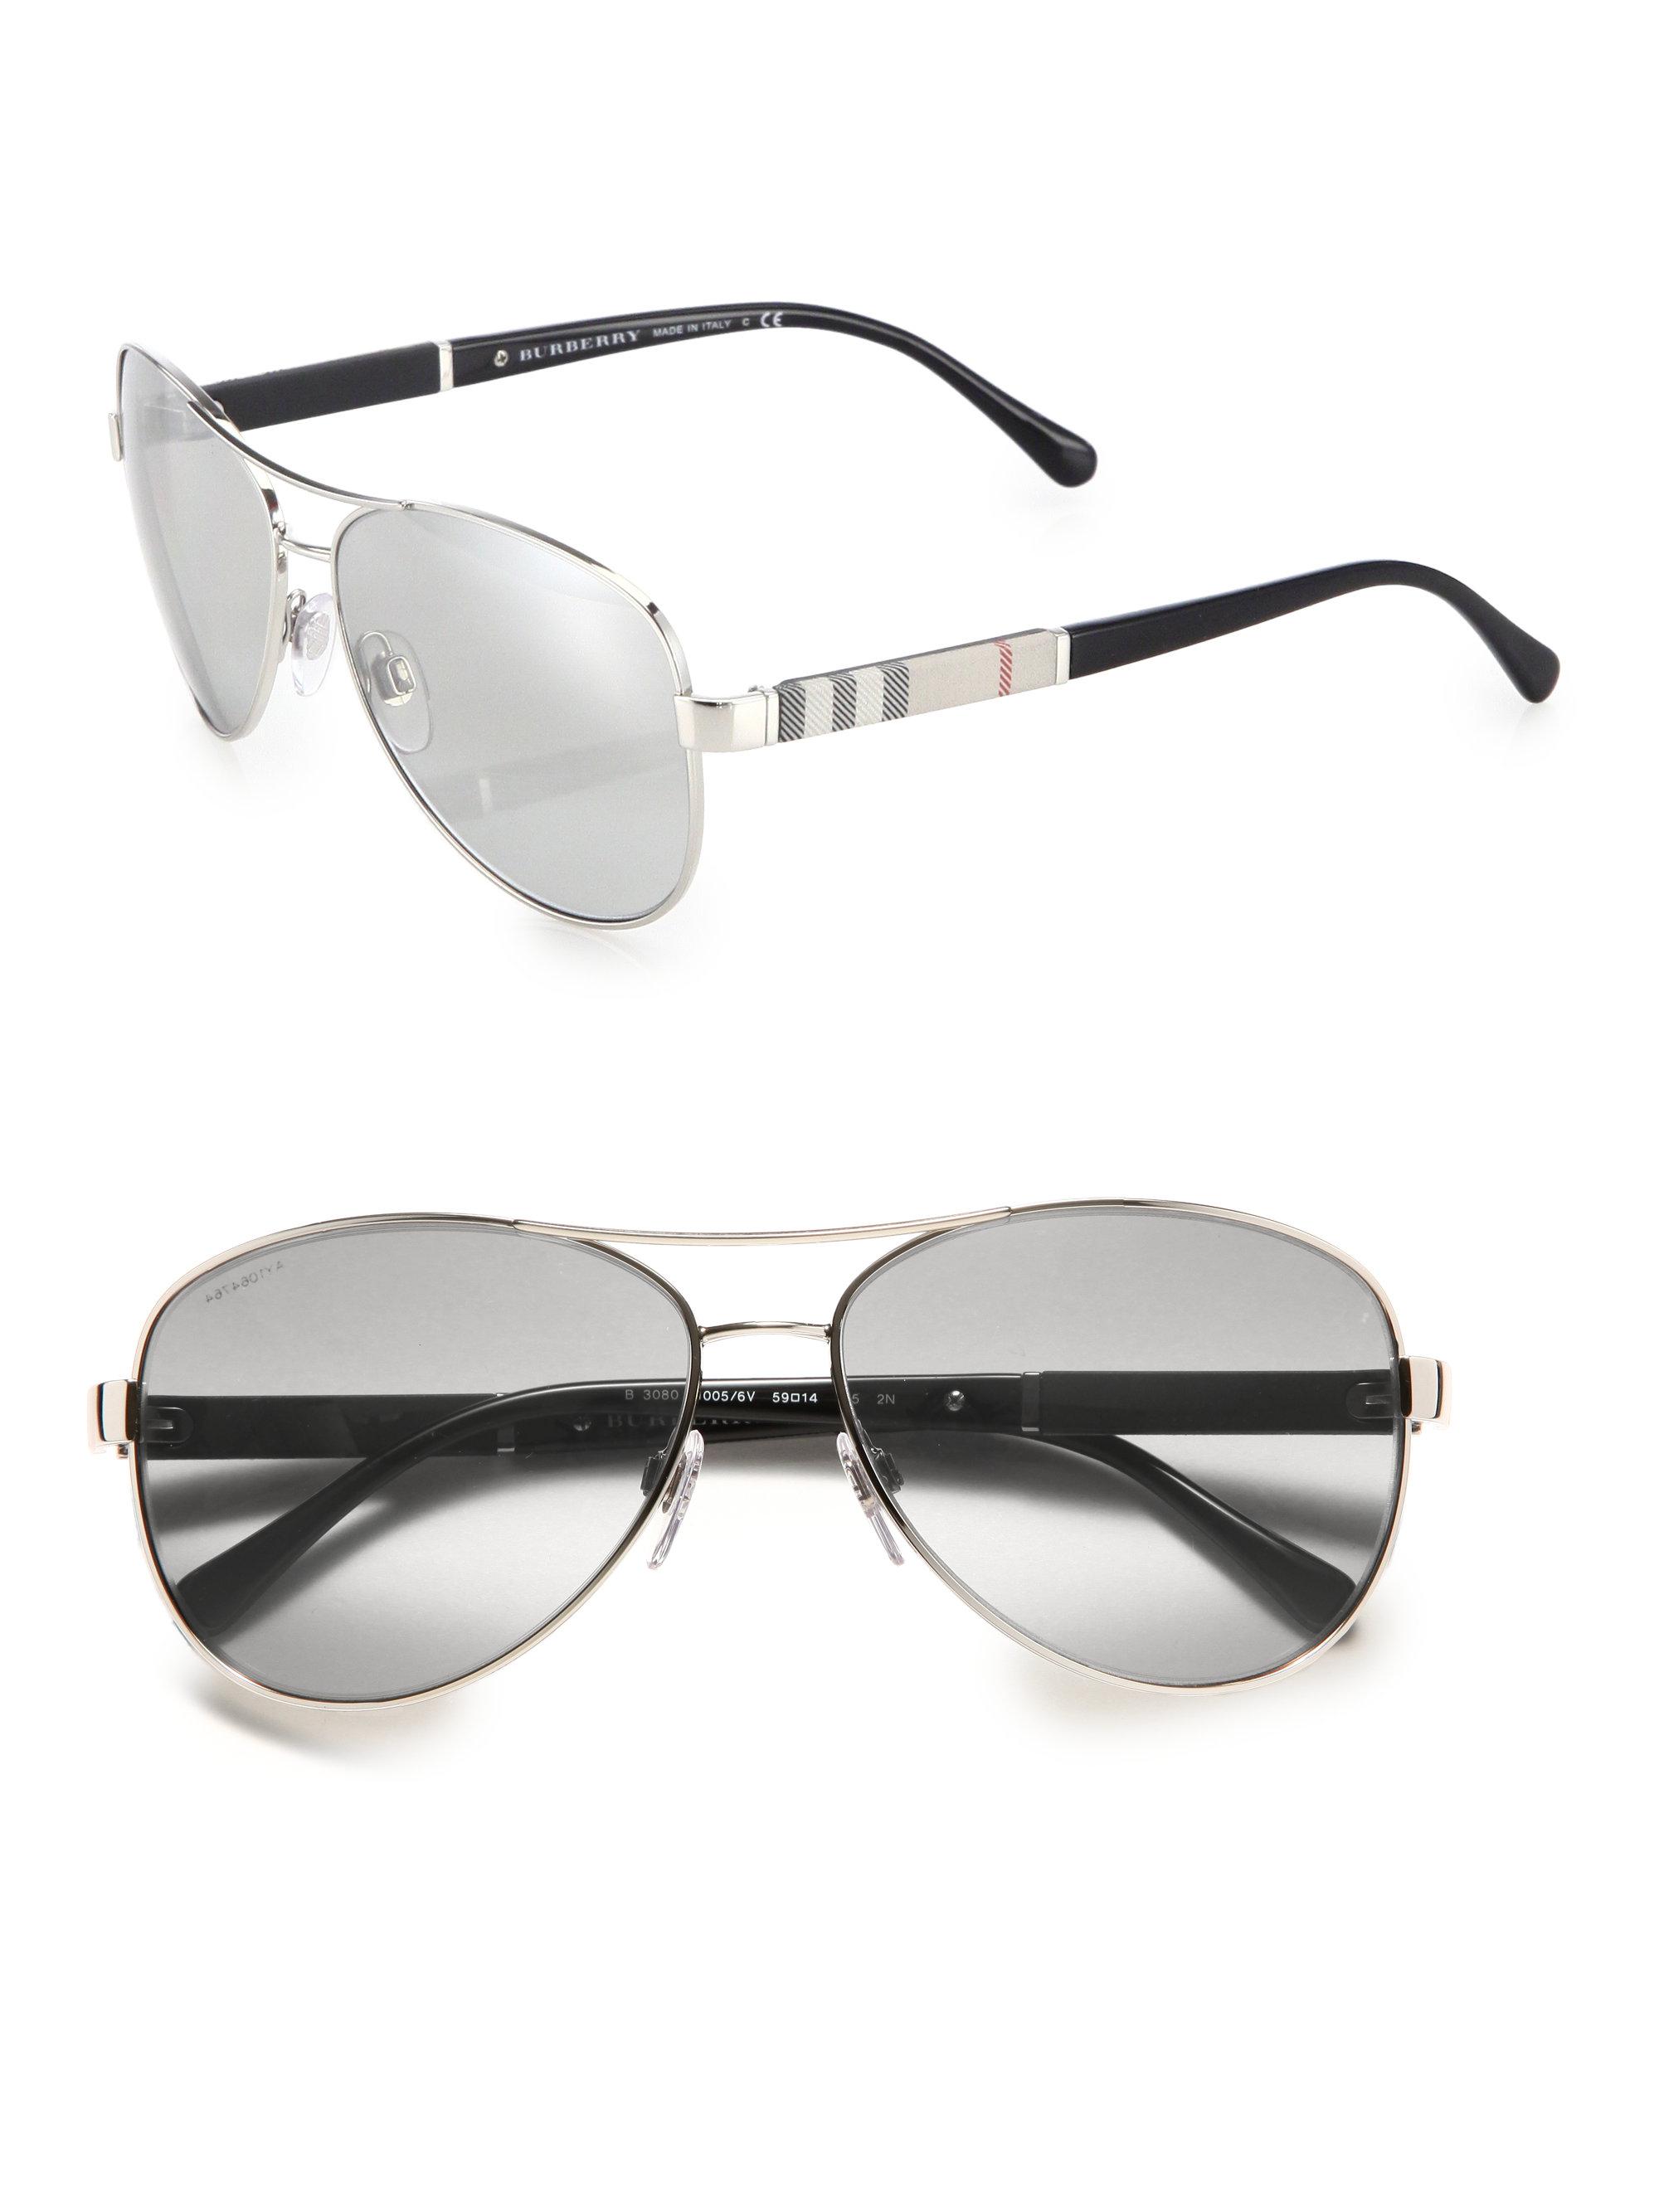 cc3051c8093 Burberry Aviator Sunglasses Men - Bitterroot Public Library